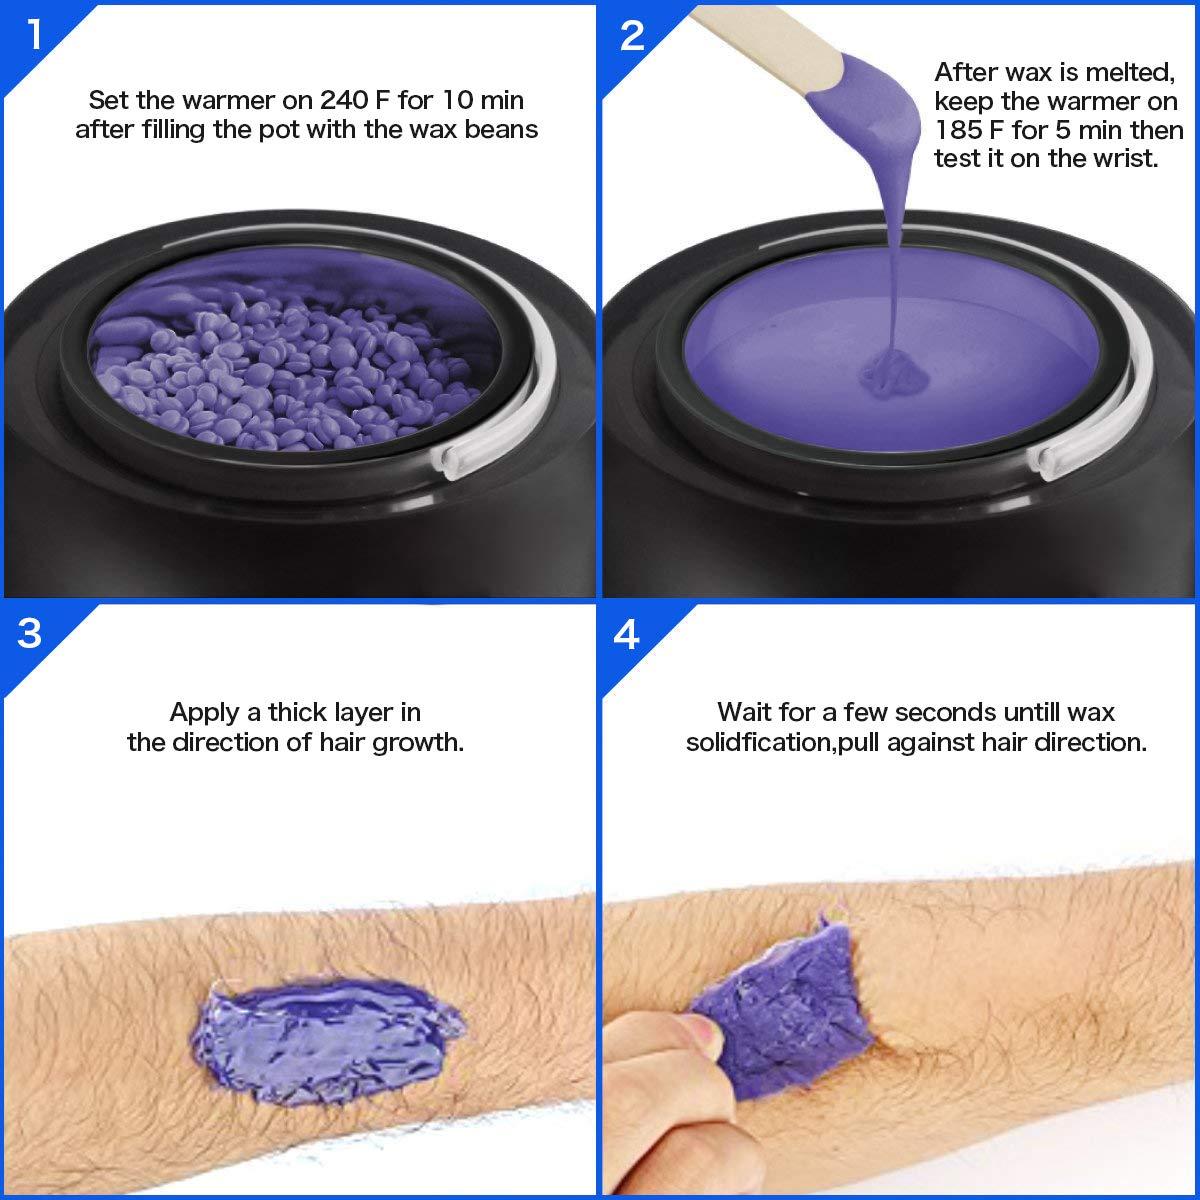 Wax Warmer Profession Electric Wax Heater Pot Waxing Kit Set Hair Removal for All Wax 6 Different Flavors Hard Wax Beans+20 Applicator Sticks LCD Digital Display Black